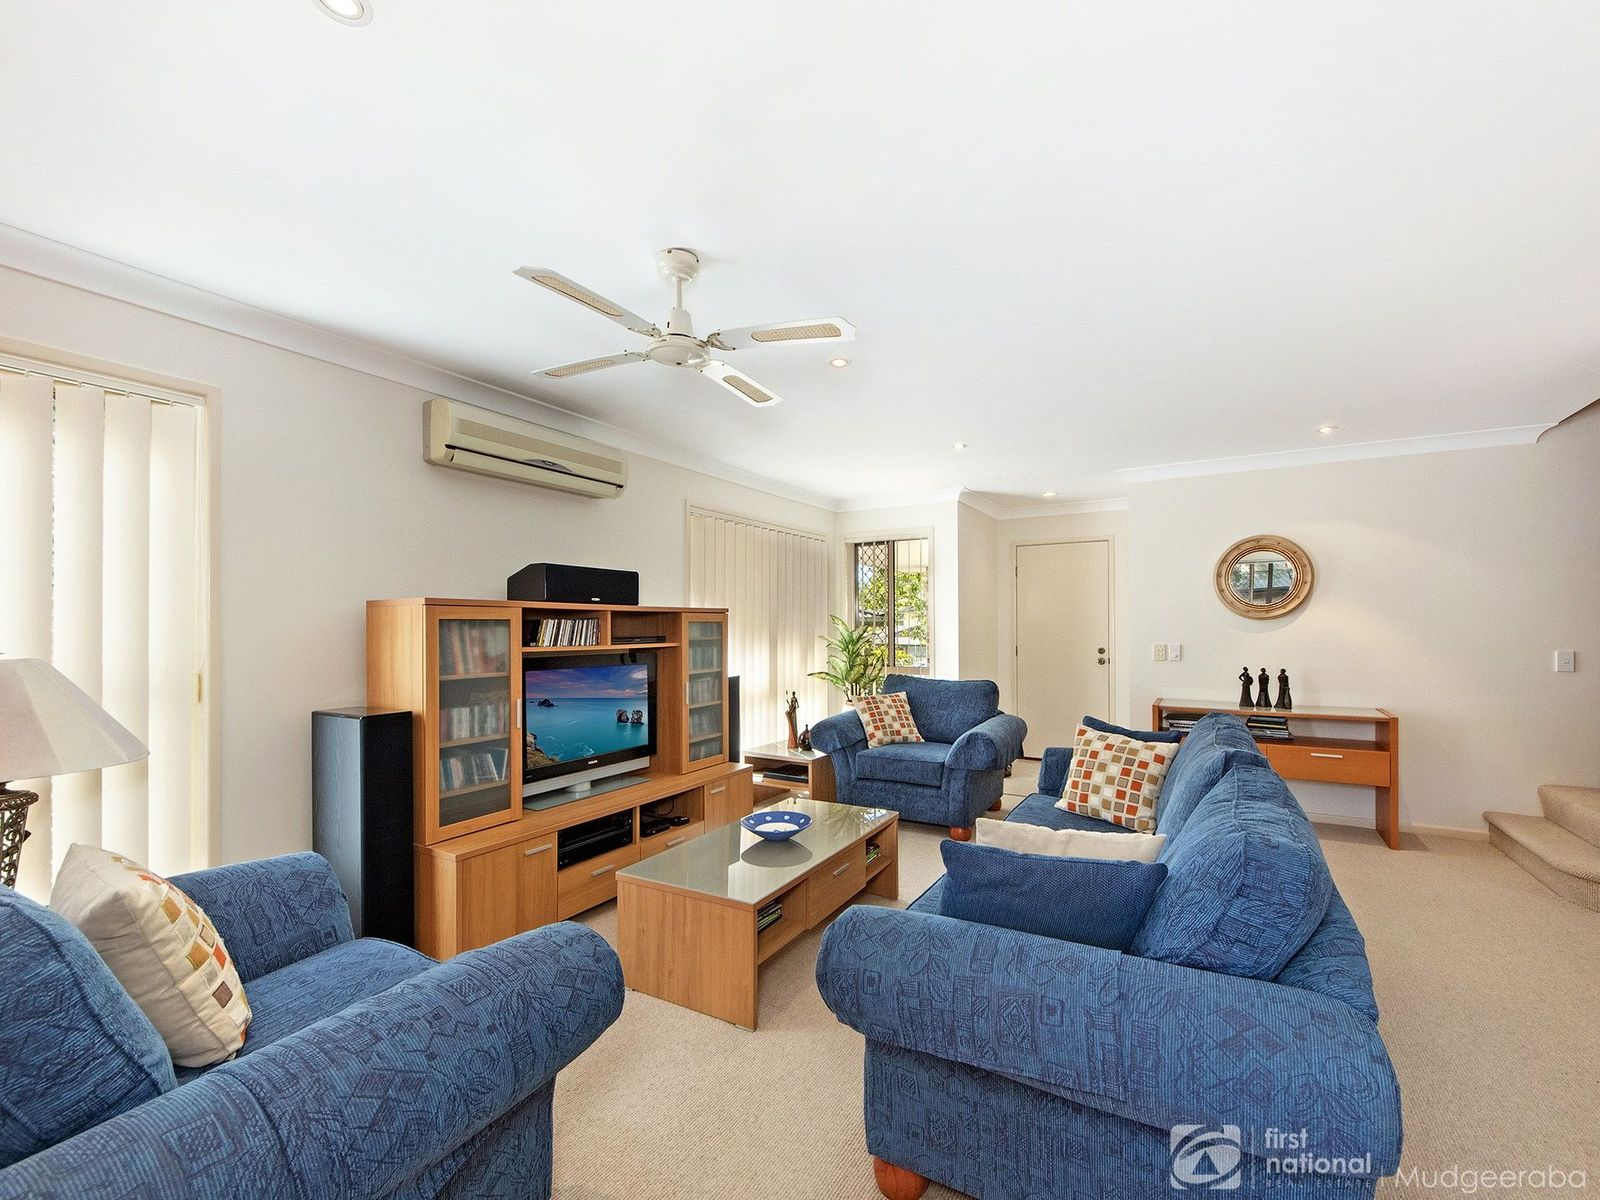 52/31 Leviathan Drive, Mudgeeraba, QLD 4213